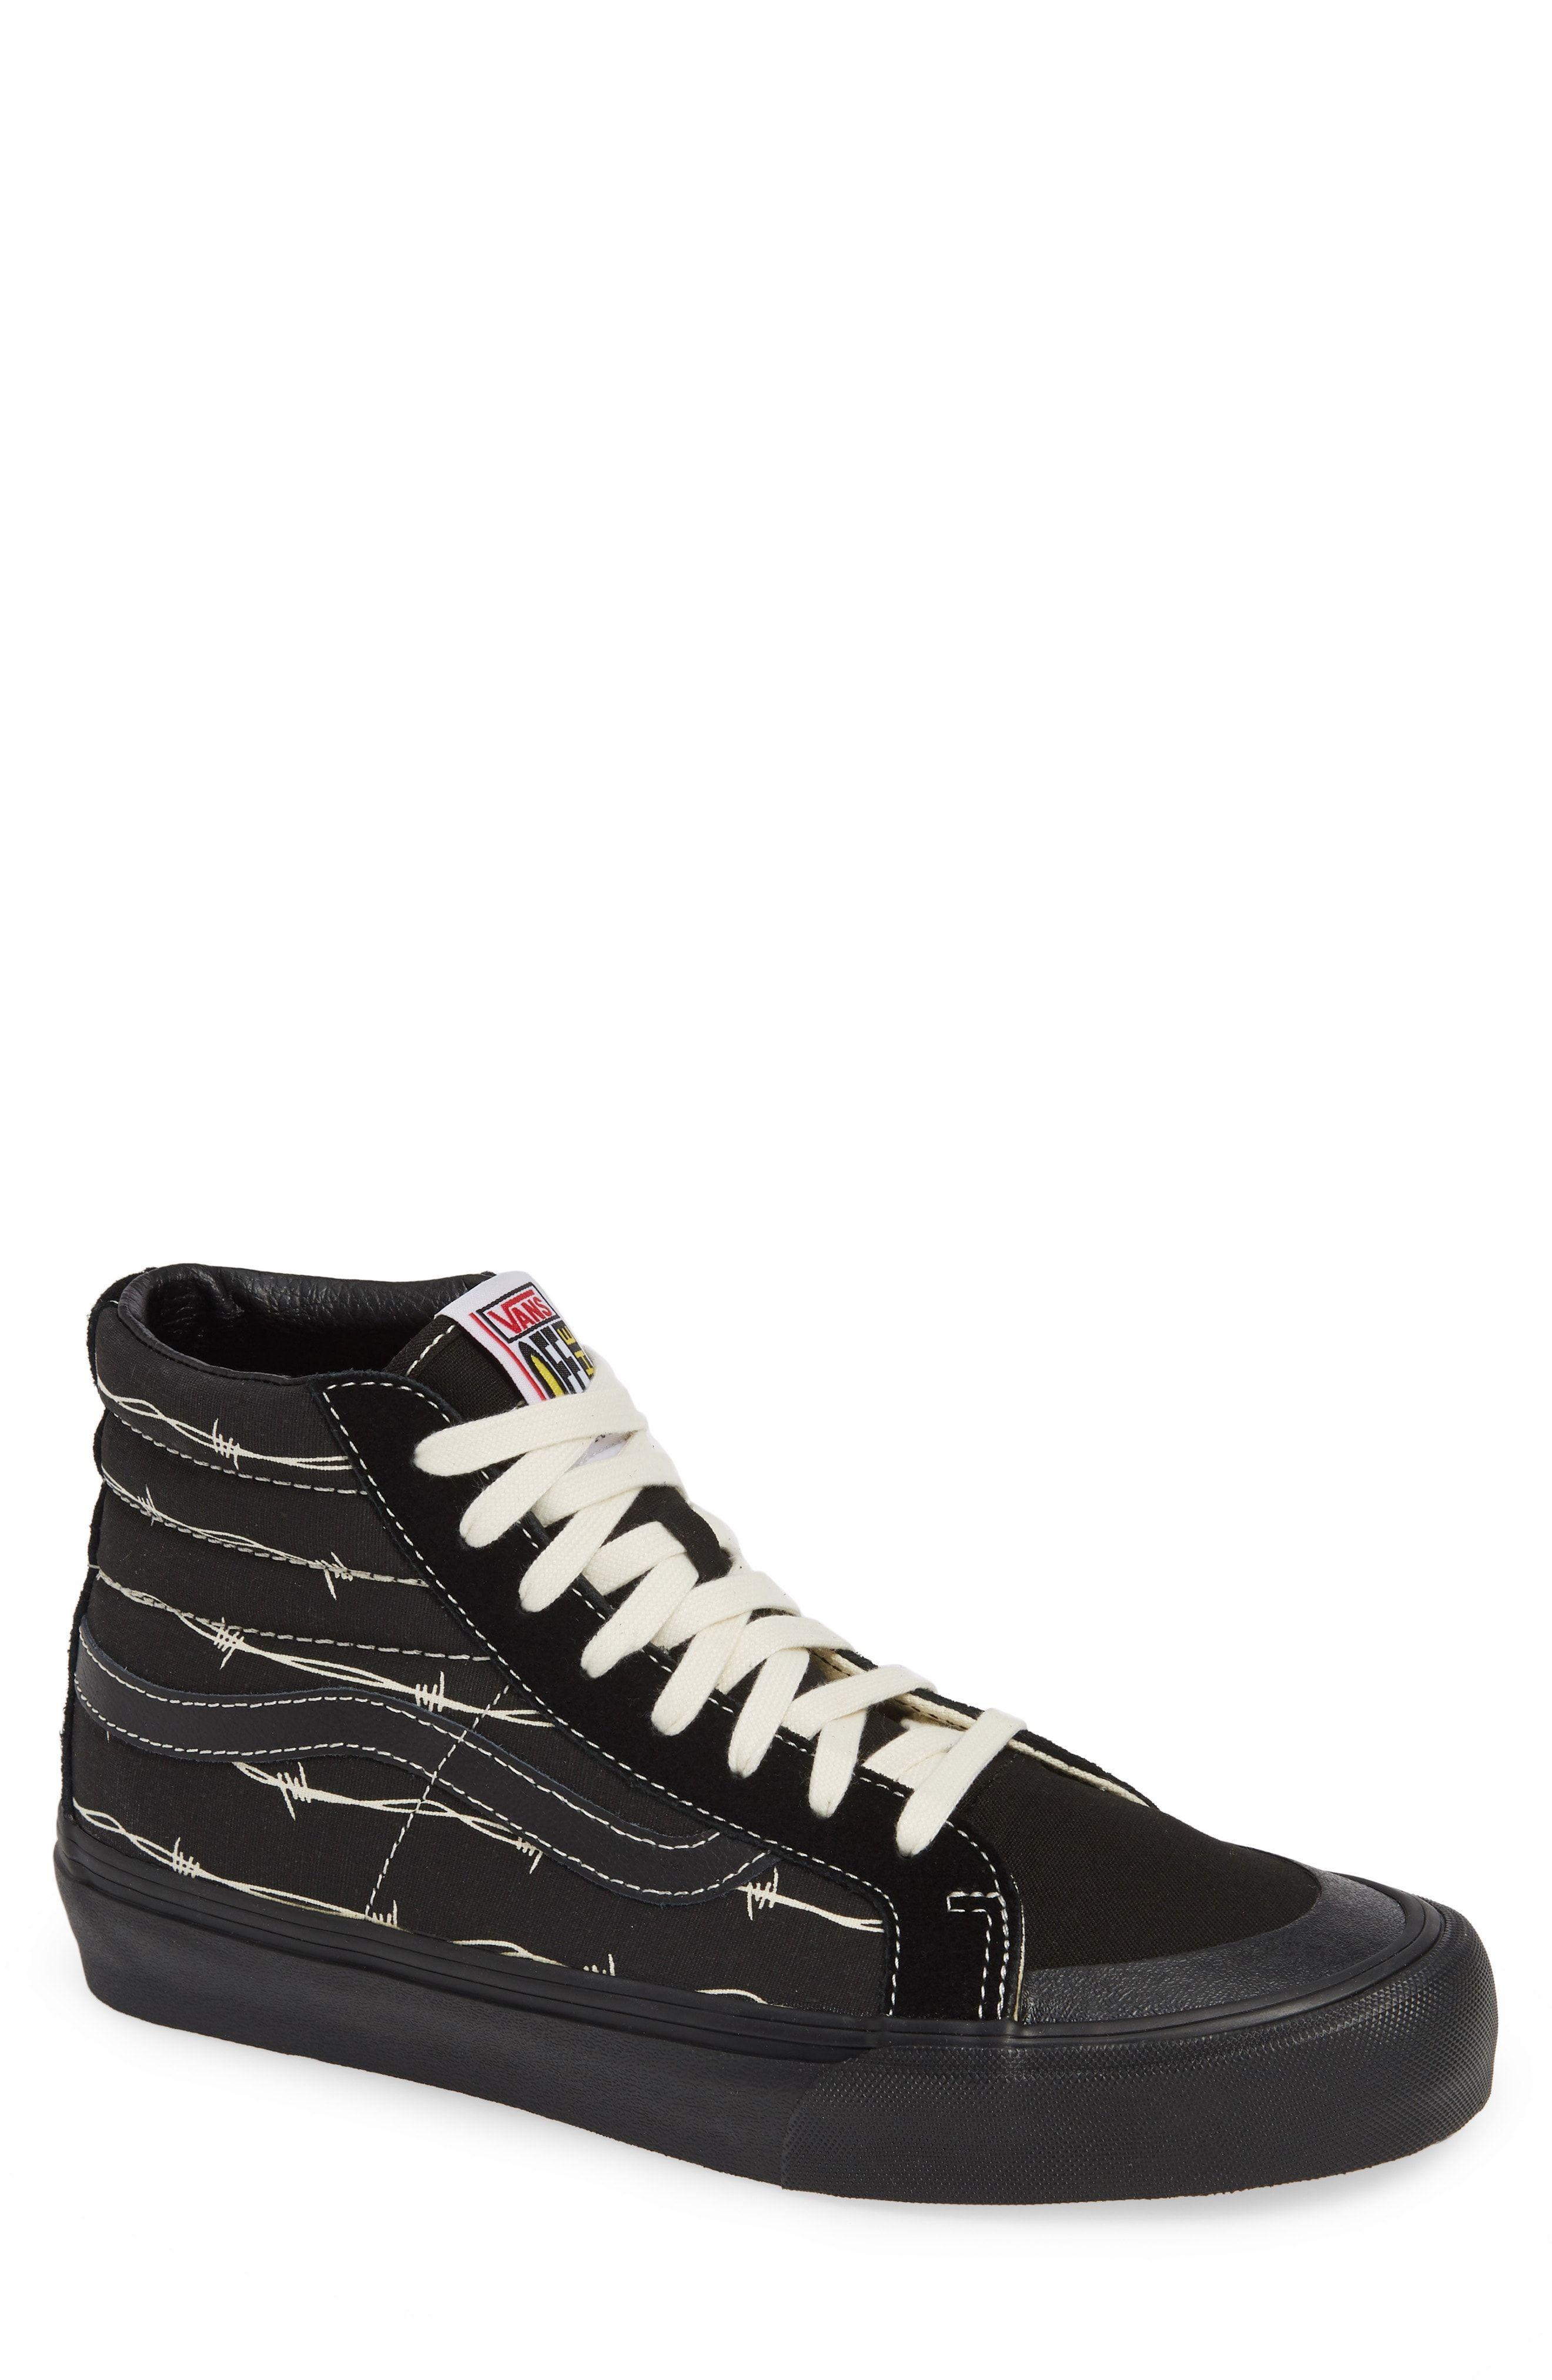 "44f128d56a DQM x Vans x Blue Note ""The Blues†Pack - EU Kicks  Sneaker Magazine"